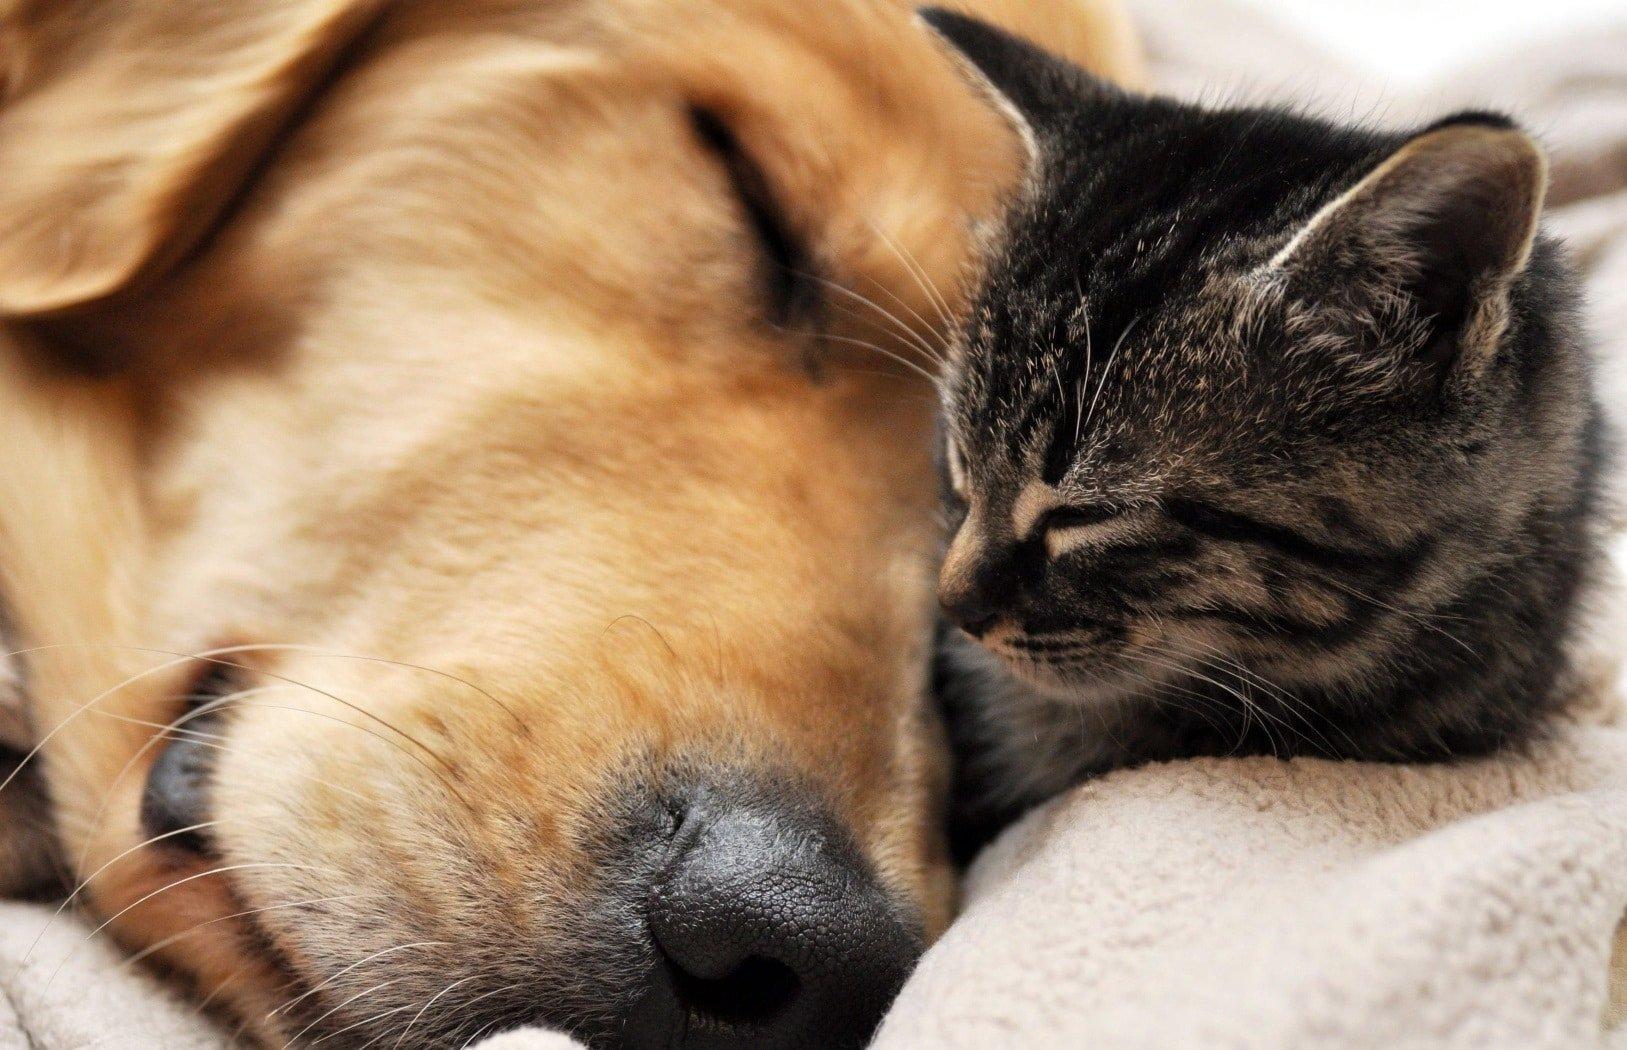 Snuggling cat & dog - pet sitting